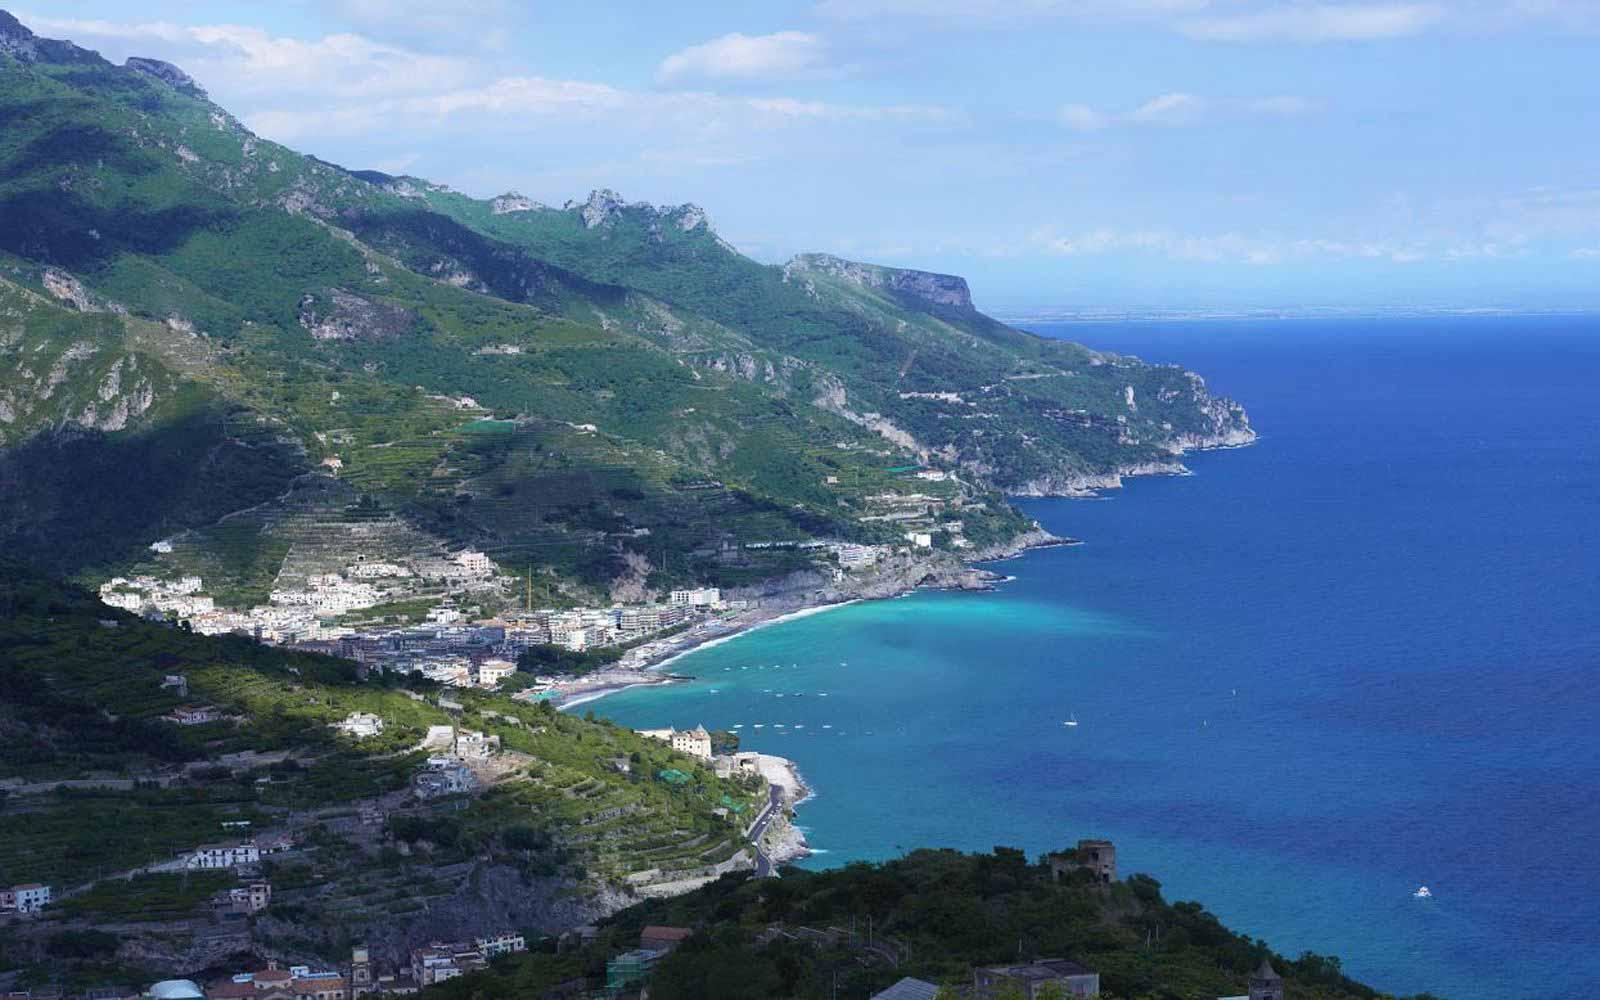 Coastline view from Palazzo Avino